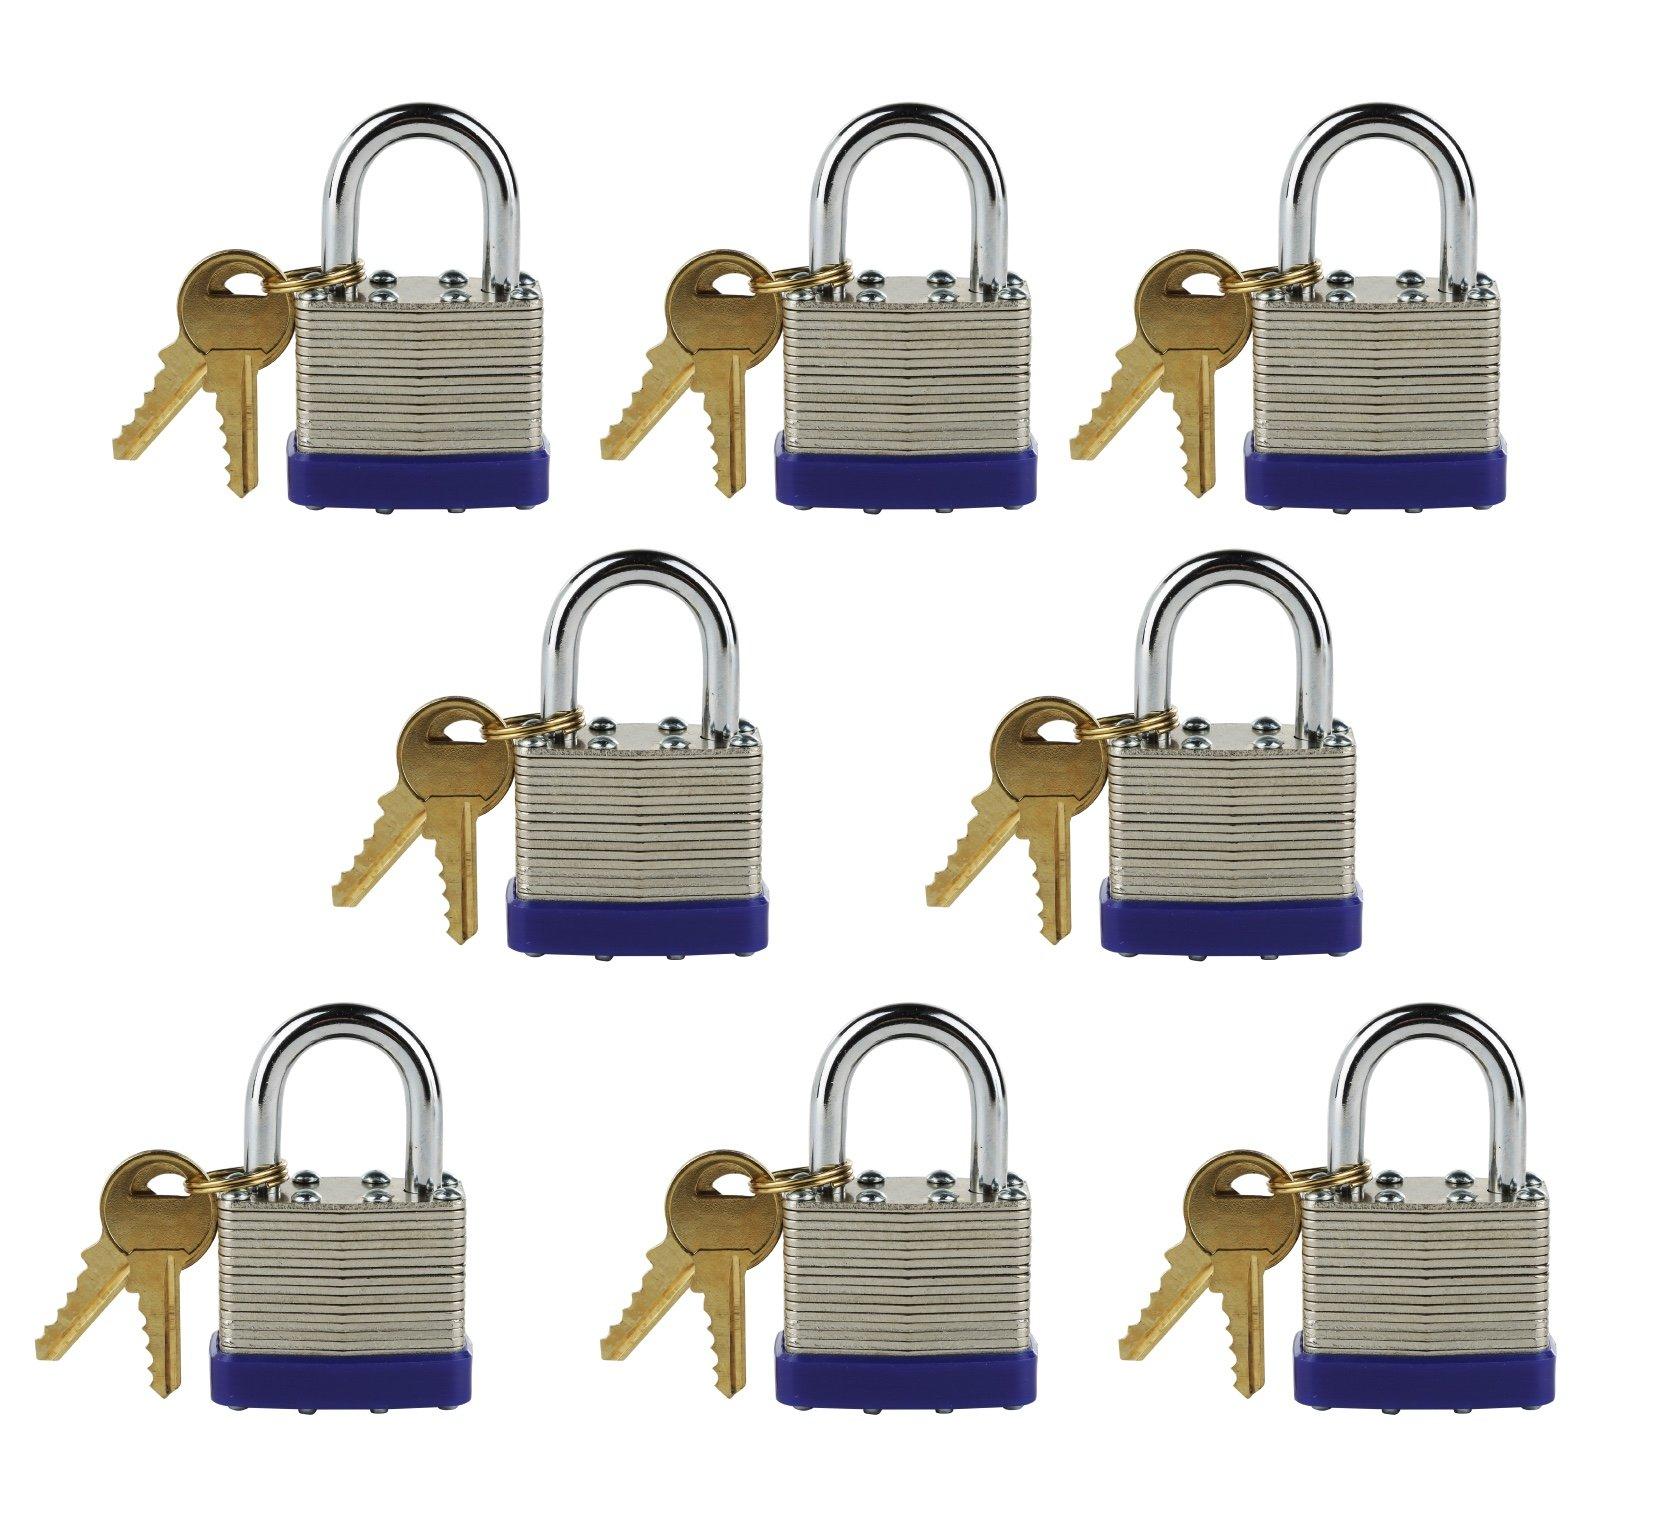 Laminated Steel Keyed-Alike Padlocks, 1 7/8'' Shackle, ¼'' Diameter (A802) 40mm Body, Multiple Padlocks (Pack of 10) by Lucky Locks